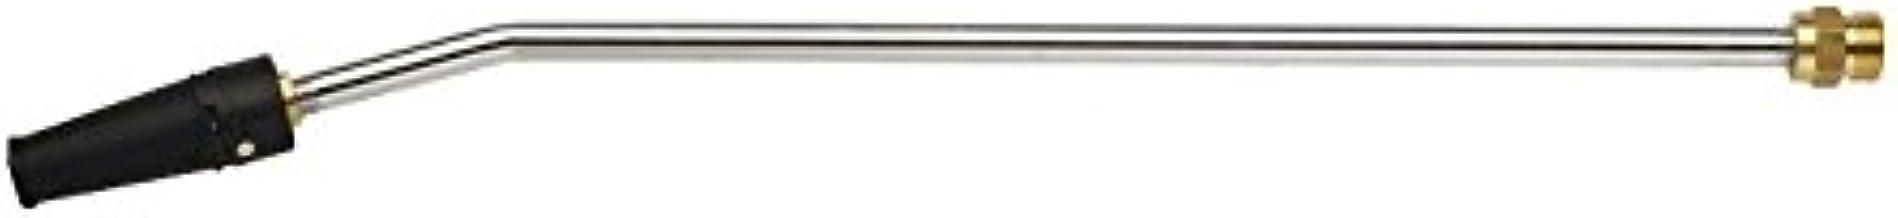 Bosch lans met variabele inktjetsproeier, lans met variabele inktjetsproeier van Bosch (M22 x 1,5) GHP 8 – 15 x D